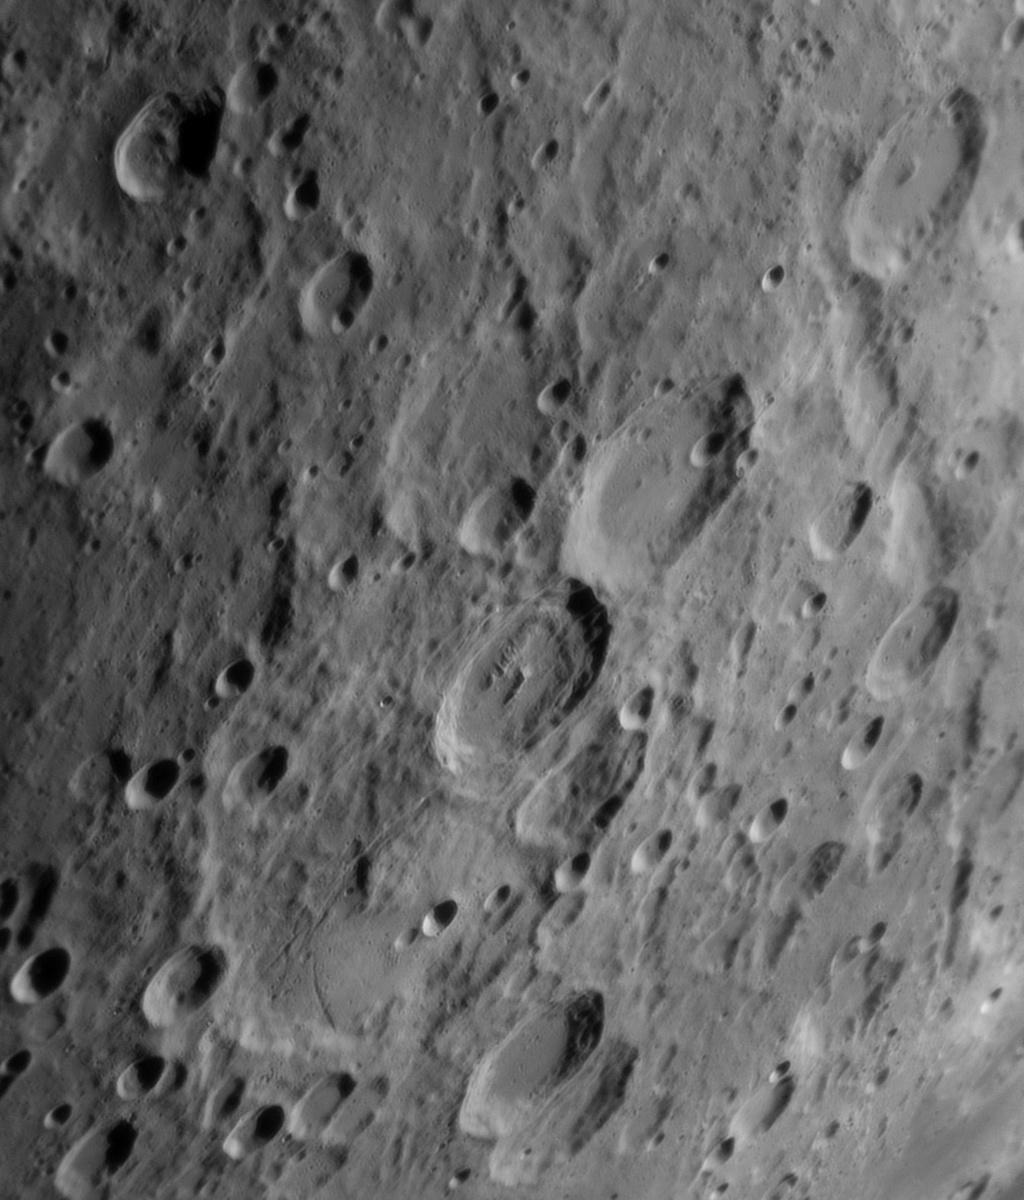 Rheita Vallis Jansen, Fabricus Metius 20190510_194249_g4_ap475_conv pop.jpg